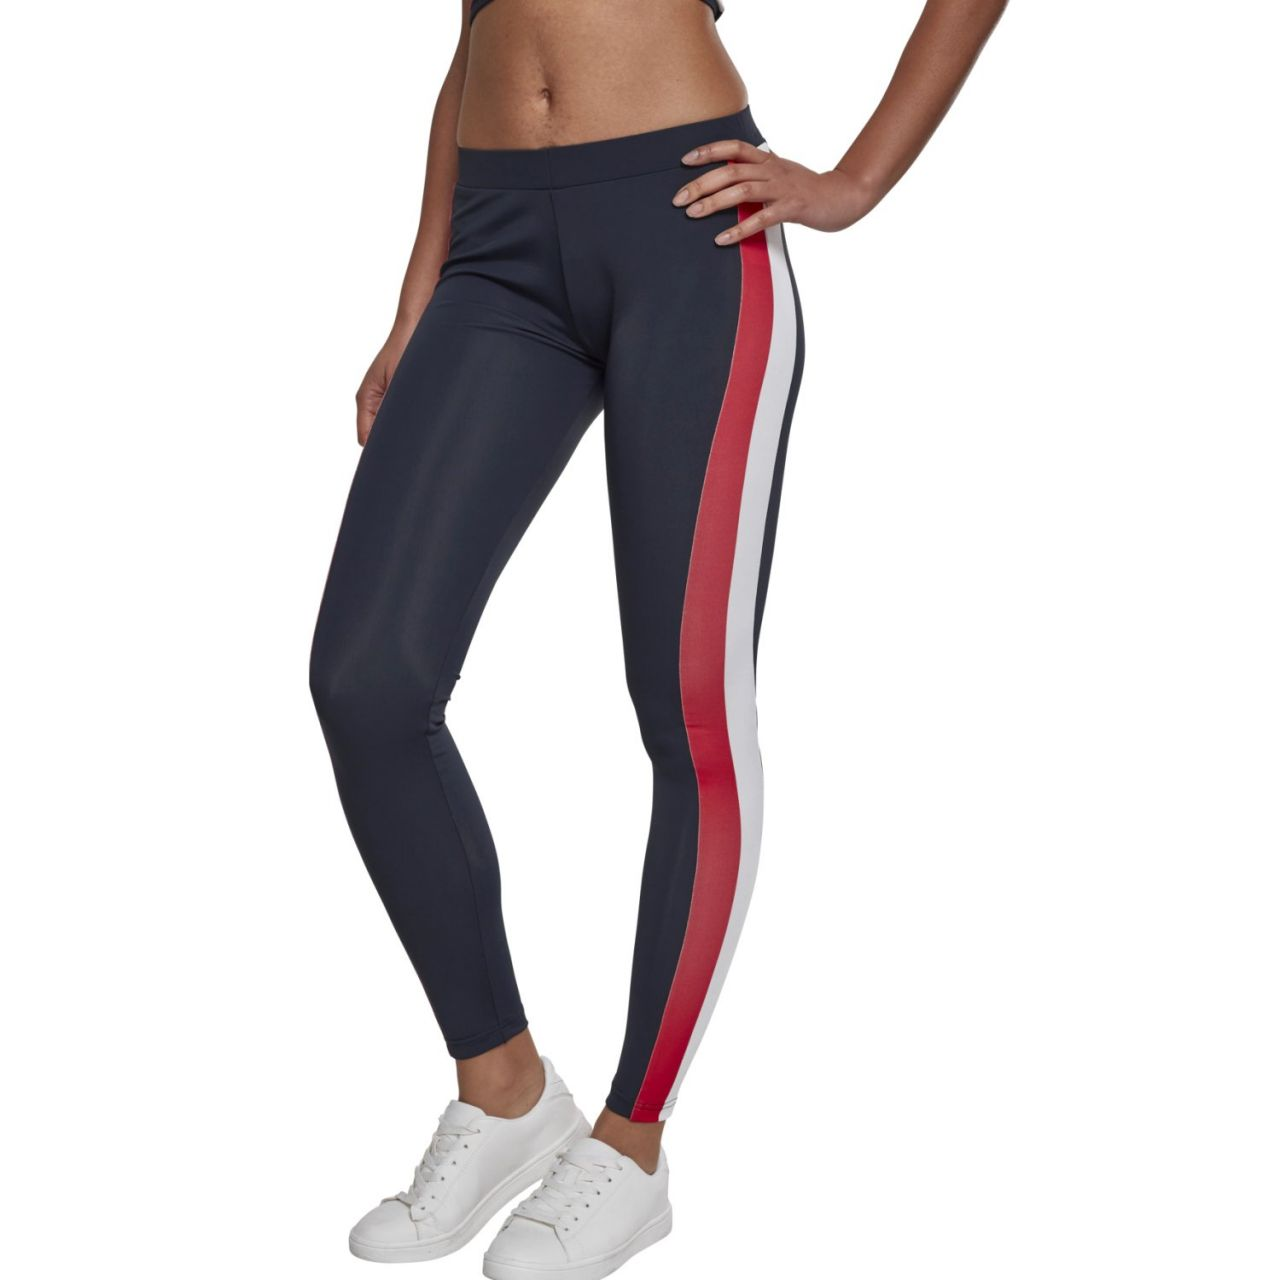 Urban Classics Ladies - SIDE STRIPE Sport Fitness Leggings